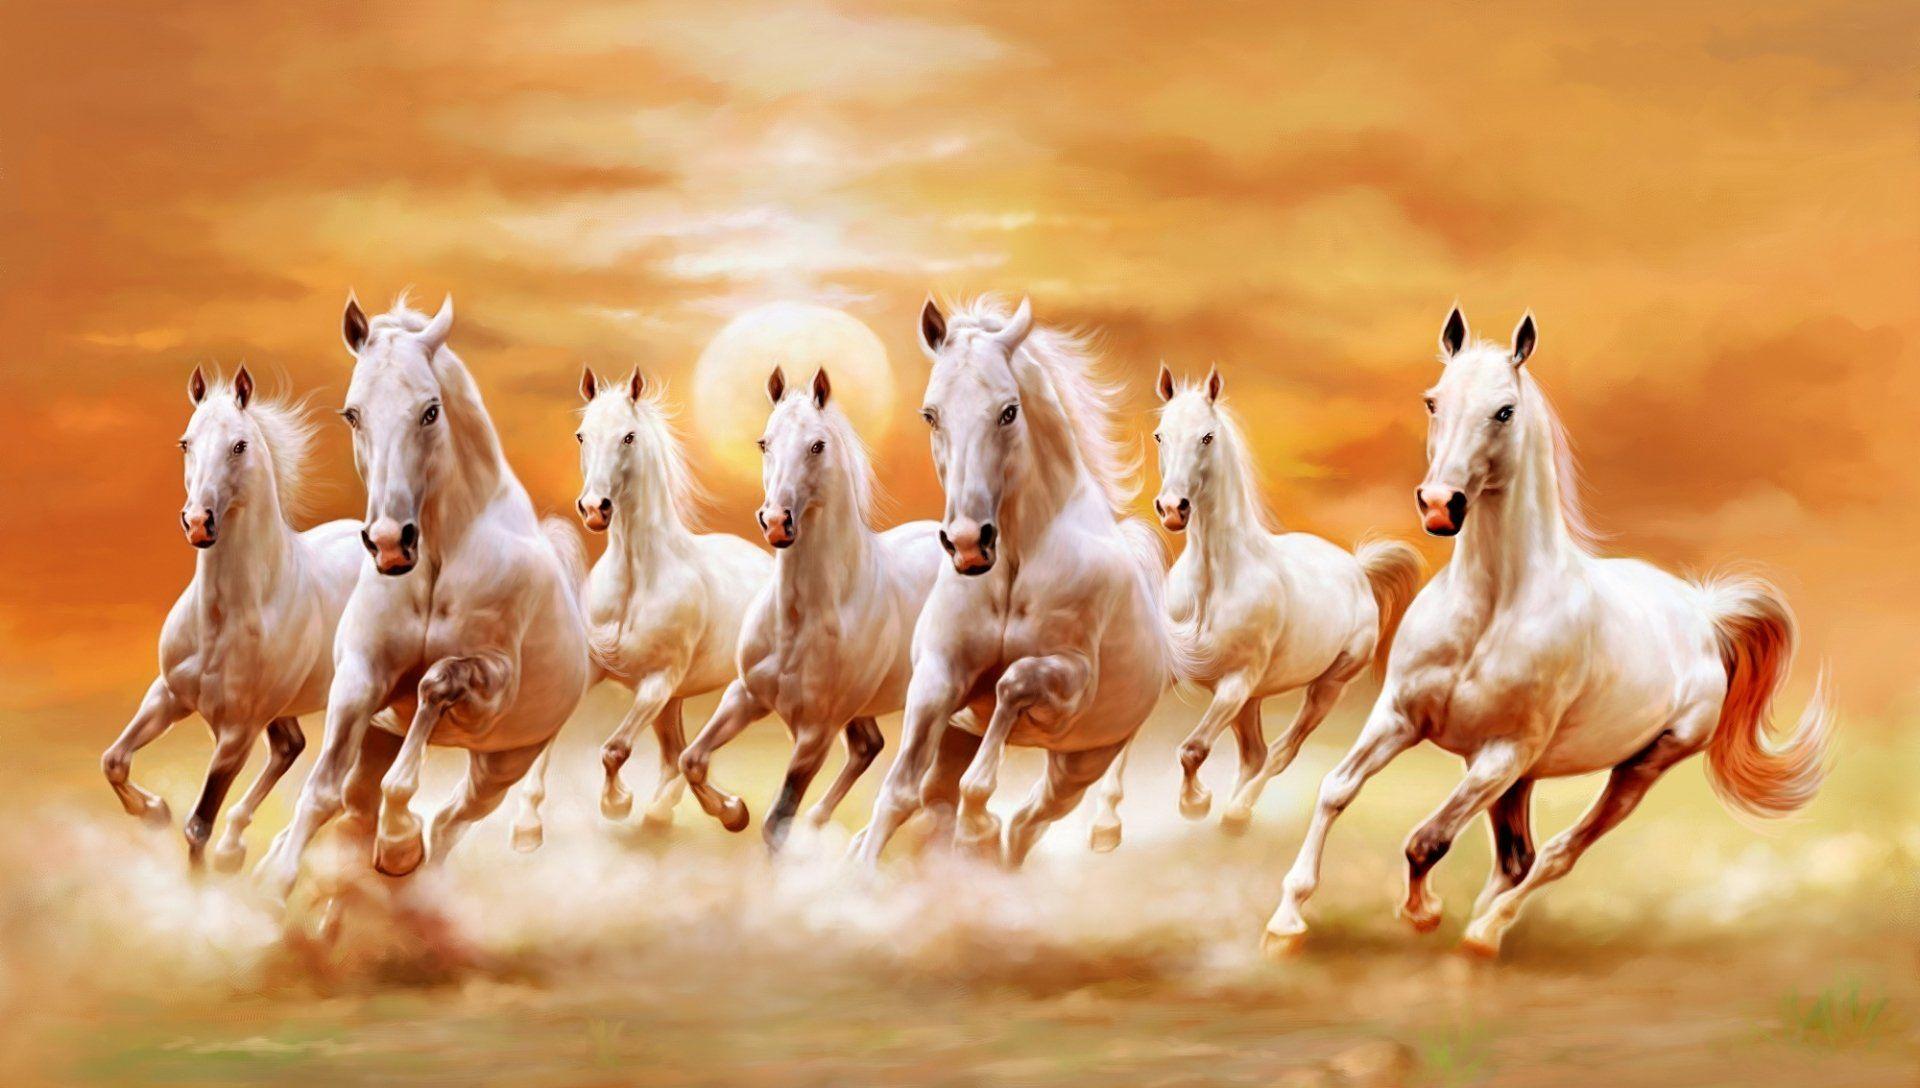 Wonderful Wallpaper Horse Laptop - 5d0d02518047b4ce6b40d2a9c47ddc72  2018_882955.jpg